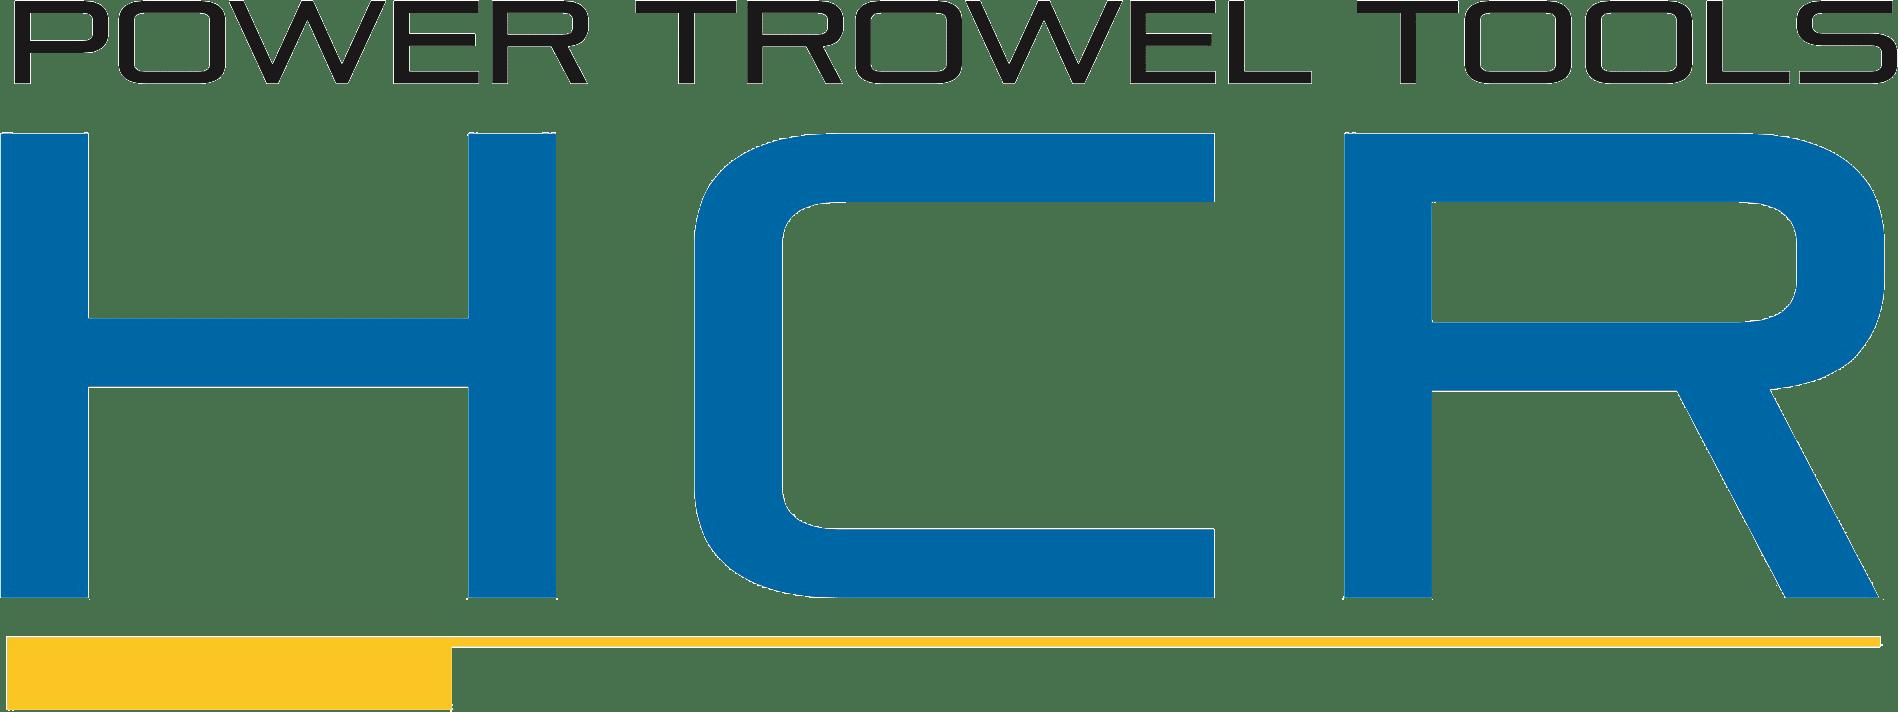 hrc trowel